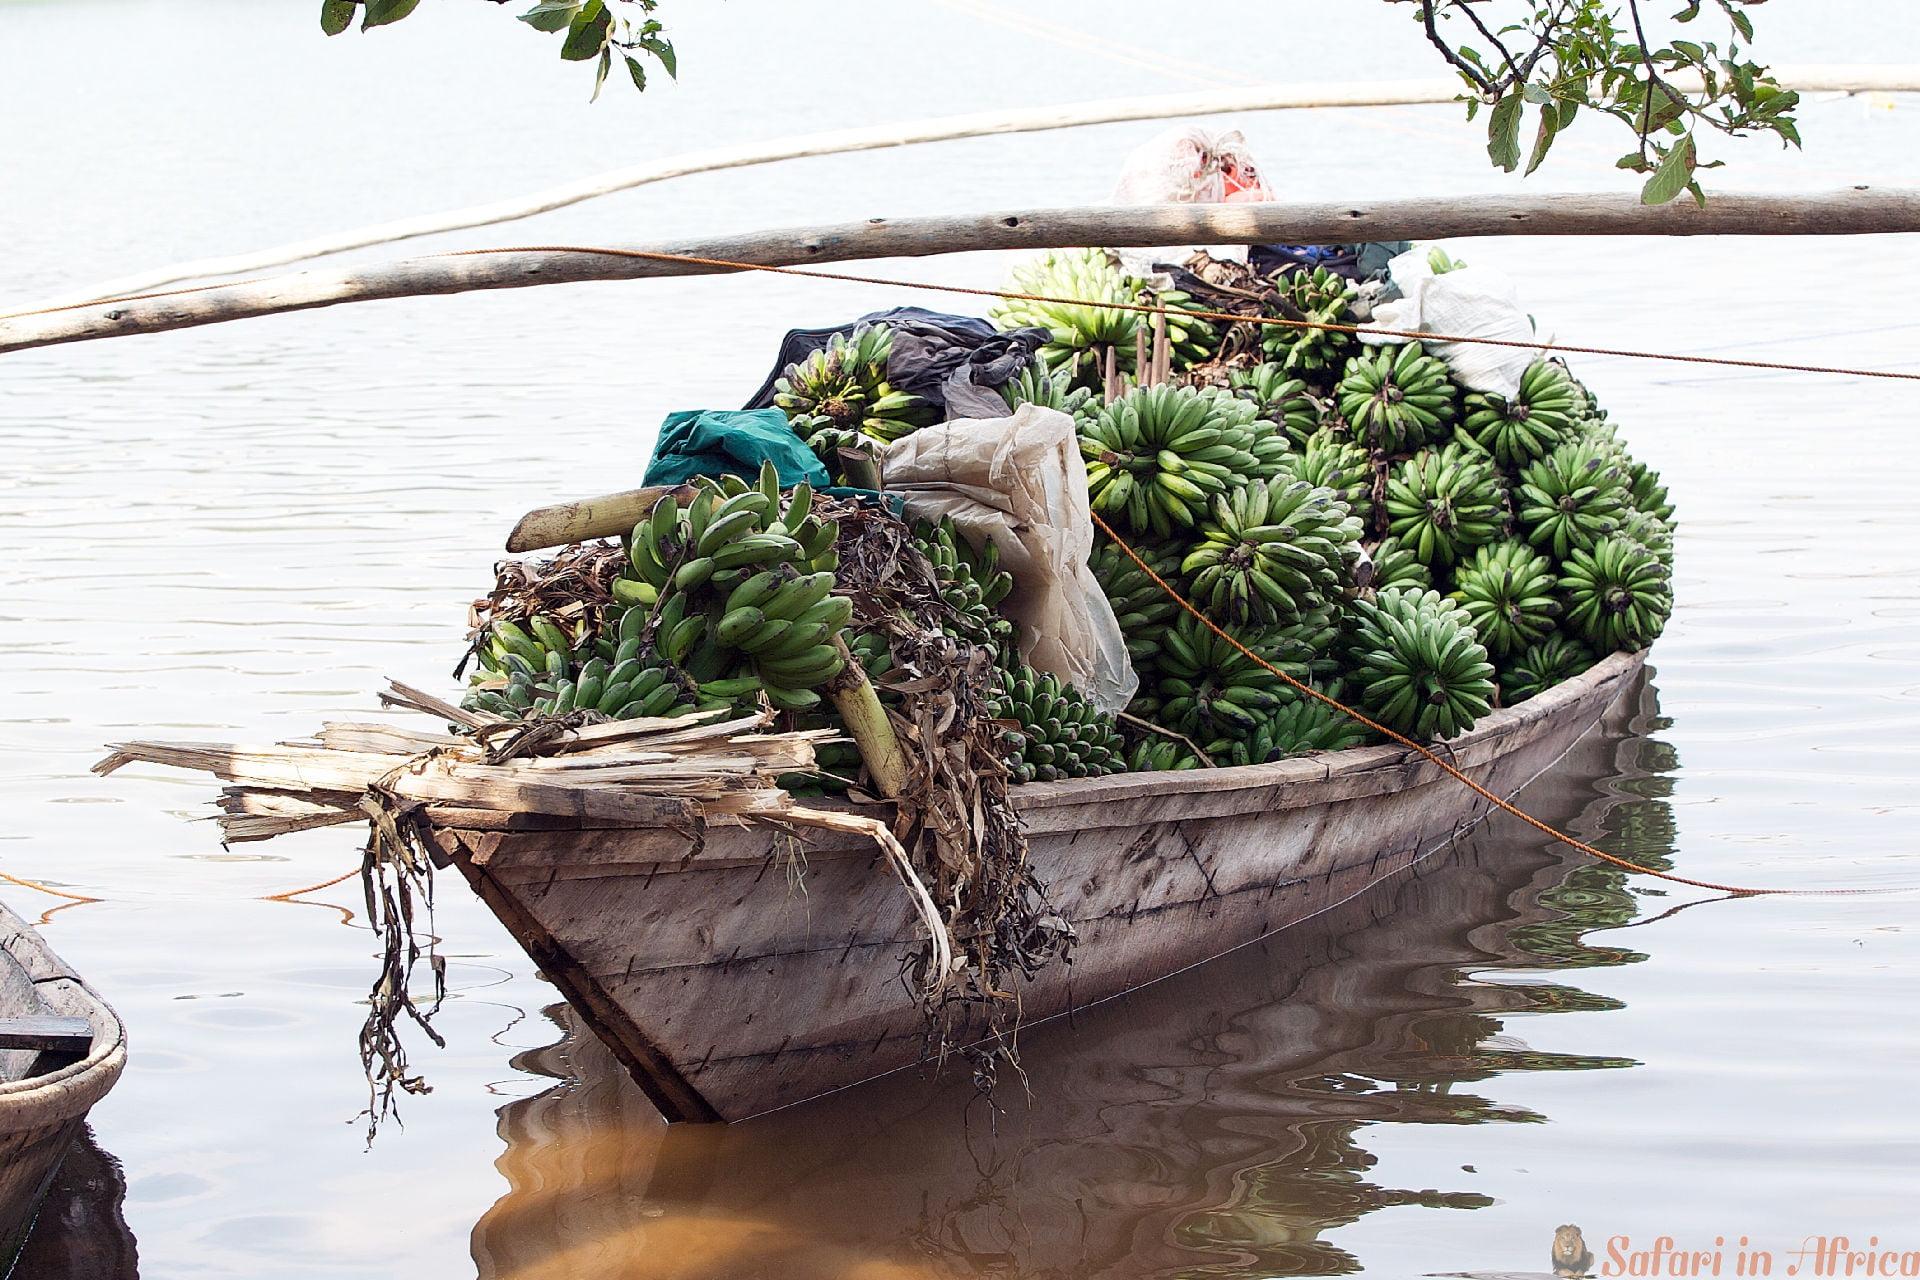 Banana Boat in Lake Kivu, Rwanda